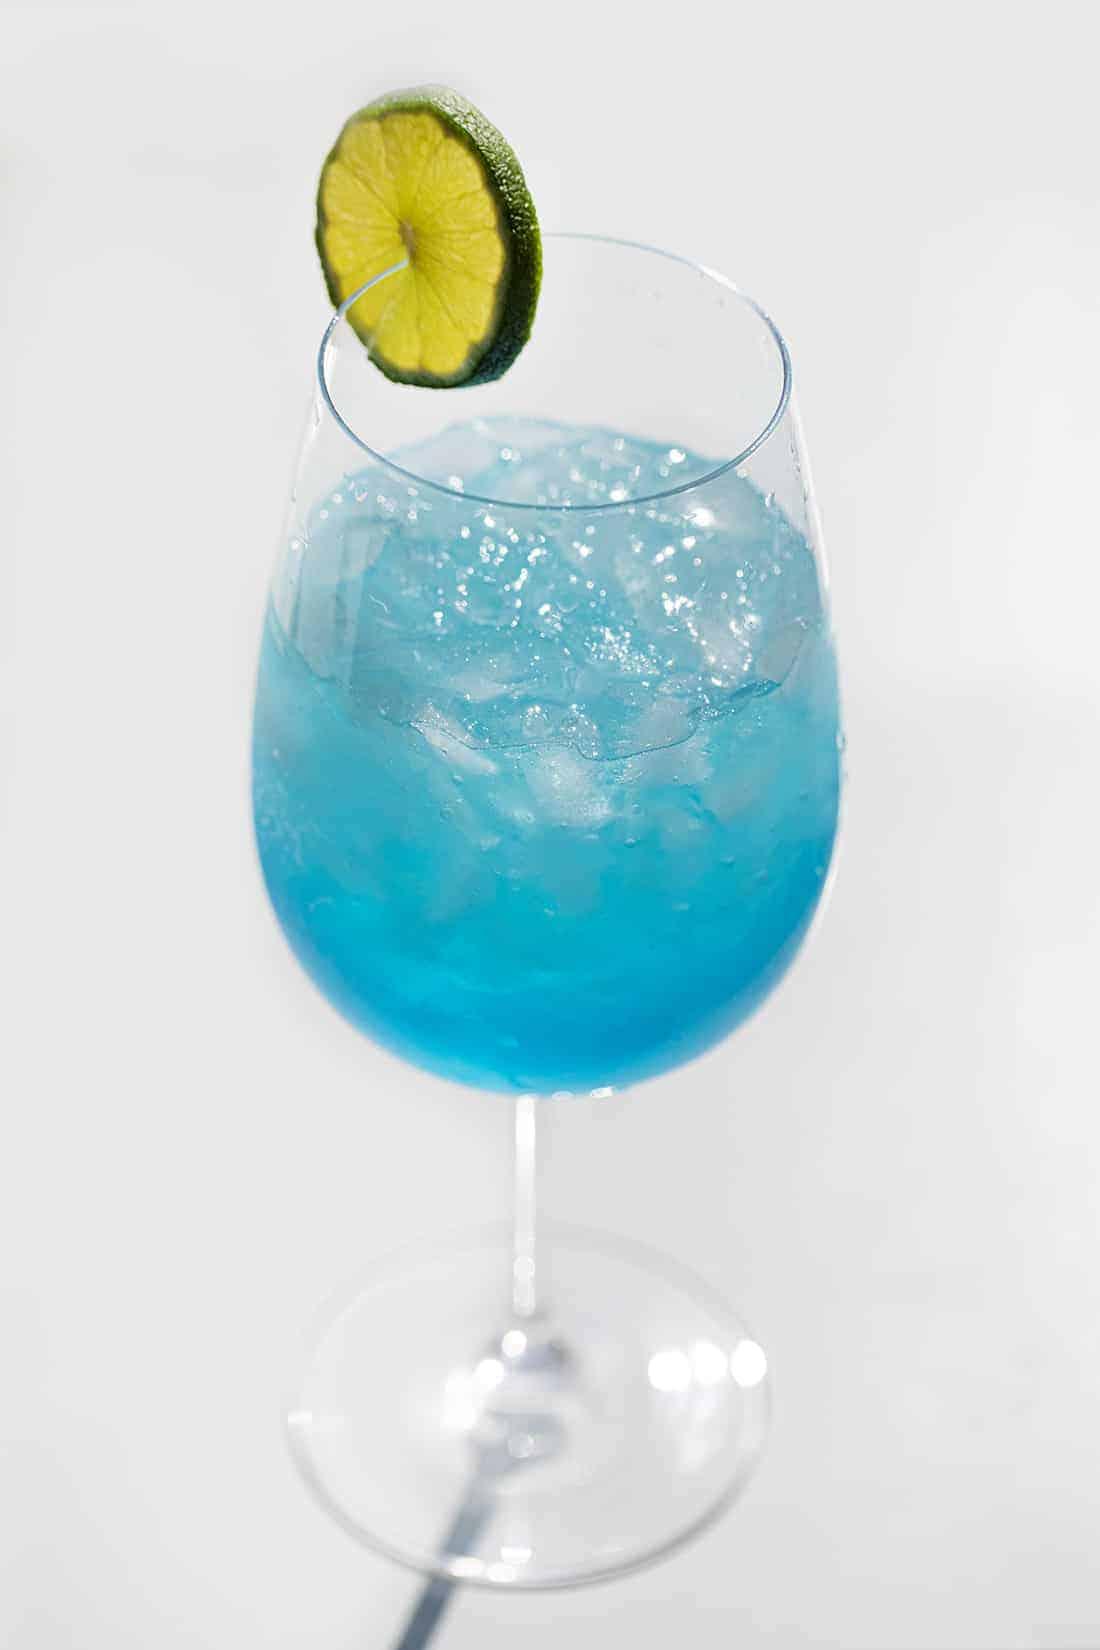 Drunken Mermaid Cocktail in the Sun